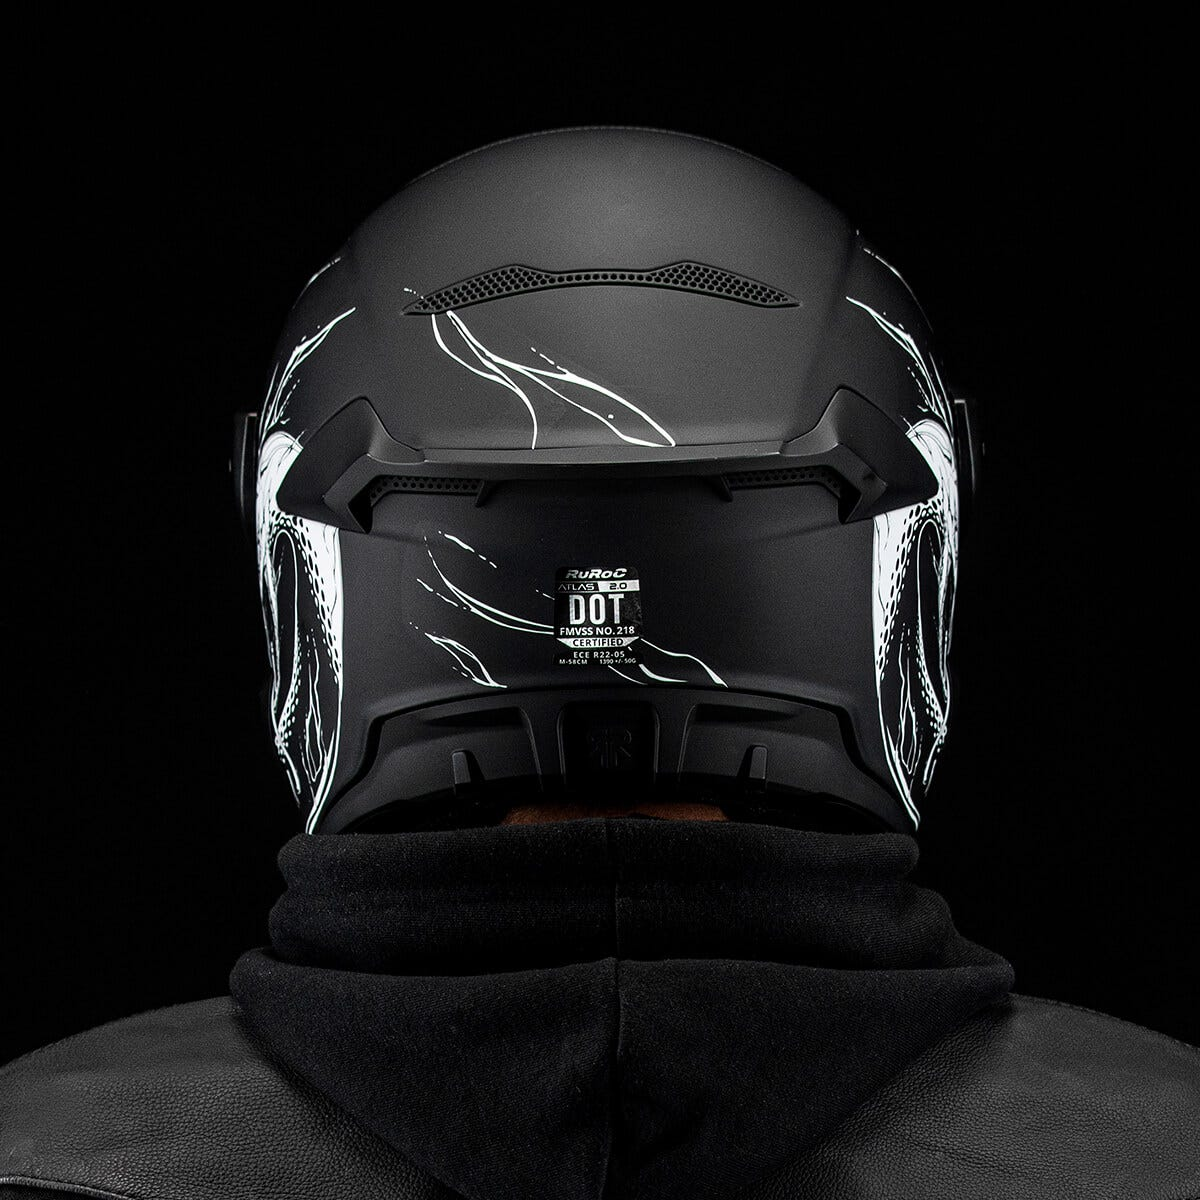 Atlas 2.0 Helmet - Nerve Decay rear